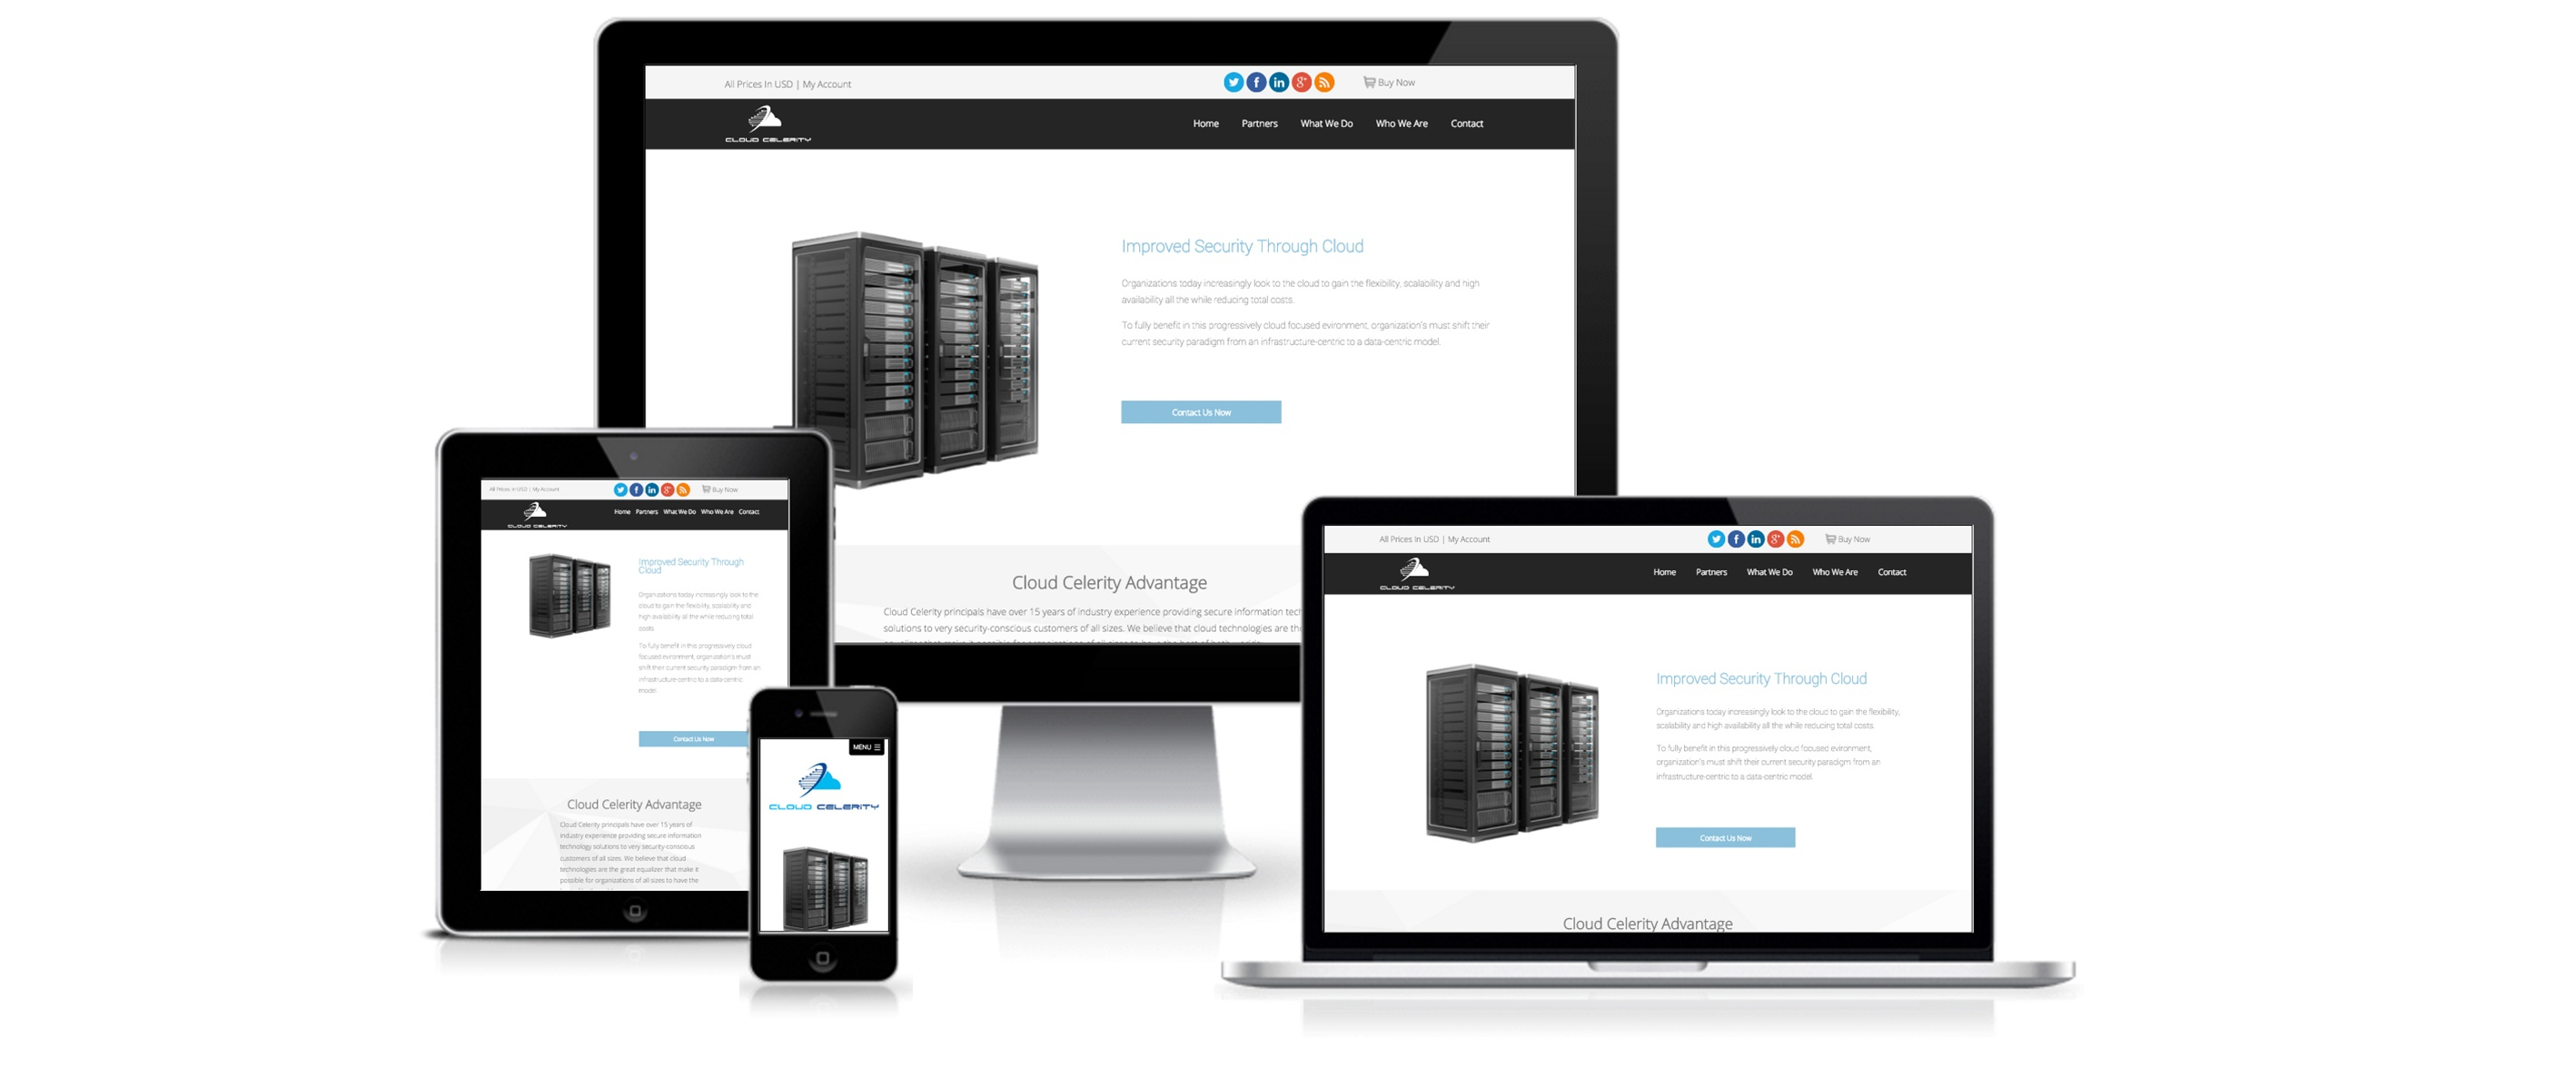 HubSpot Website Design for Cloud Celerity - by Spoke